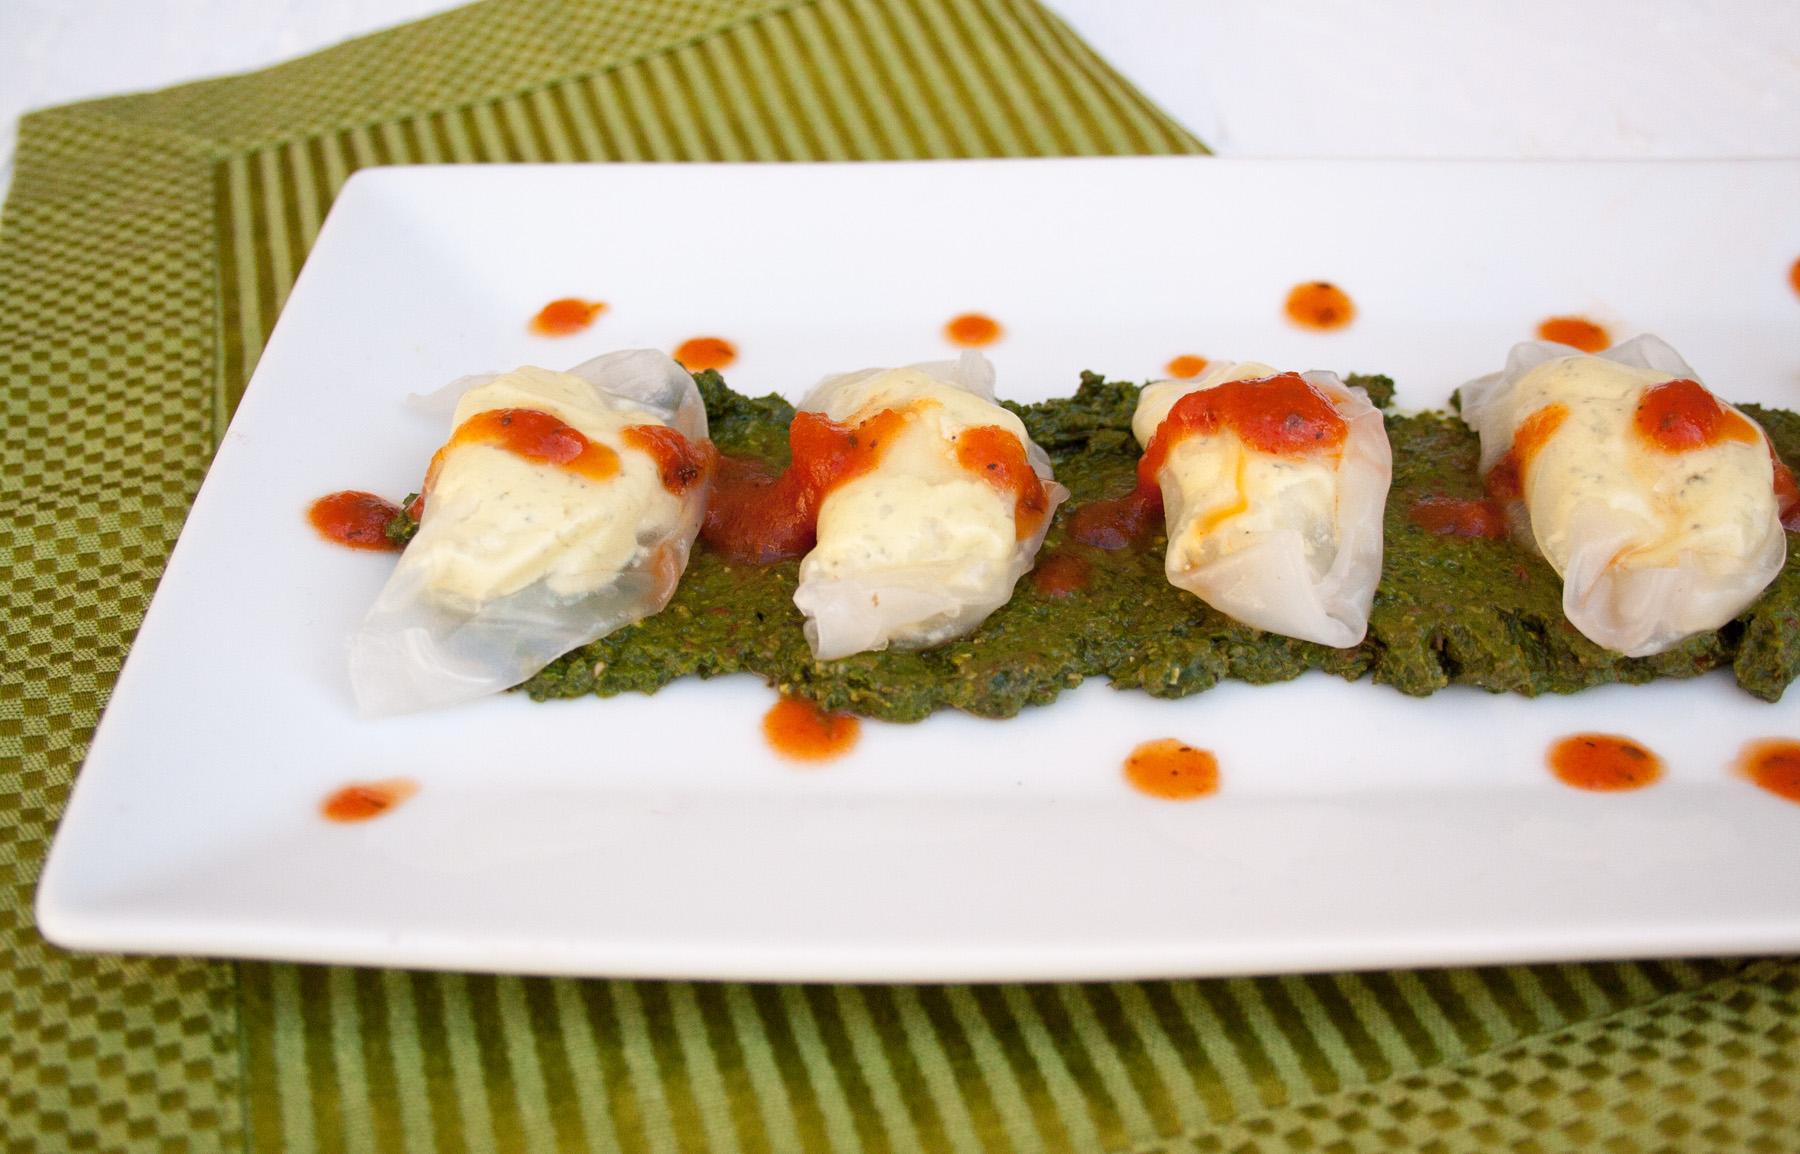 Tofu Ricotta Ravioli with Sun-Dried Tomato Basil Pesto close up.